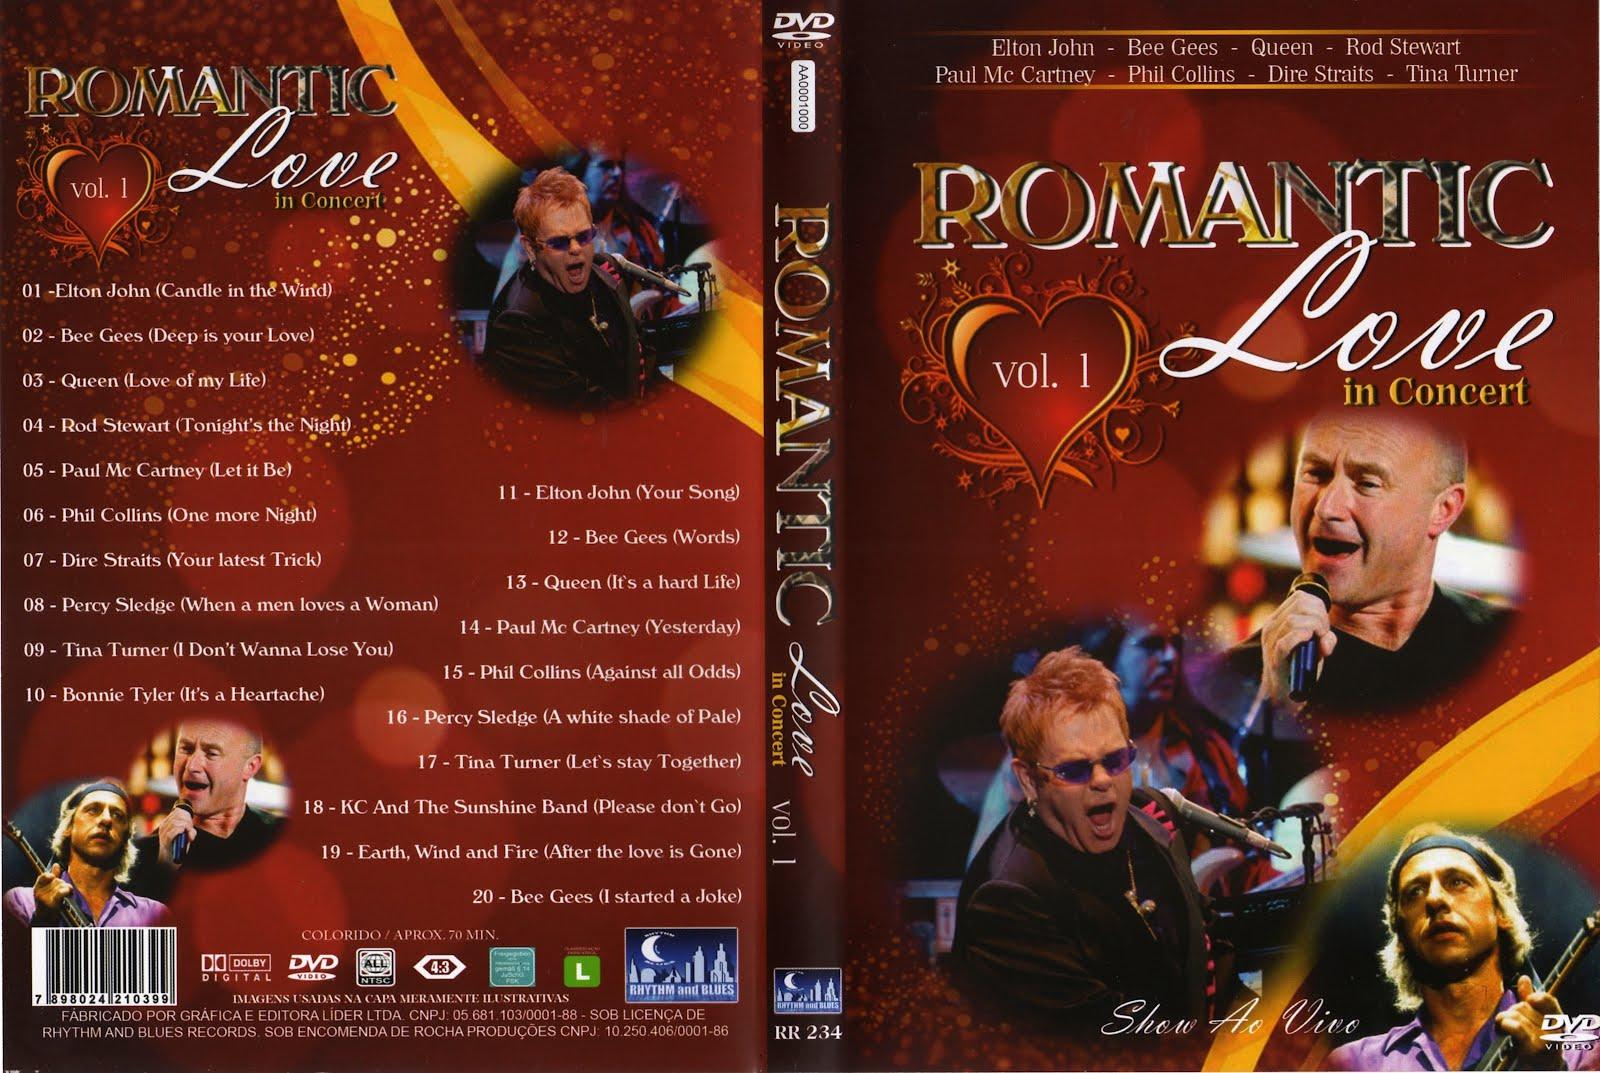 http://1.bp.blogspot.com/-yCv9FAVndag/UA_6QeKJAlI/AAAAAAAABKg/OnQhlnFPJYU/s1600/romantic+love+concert.jpg